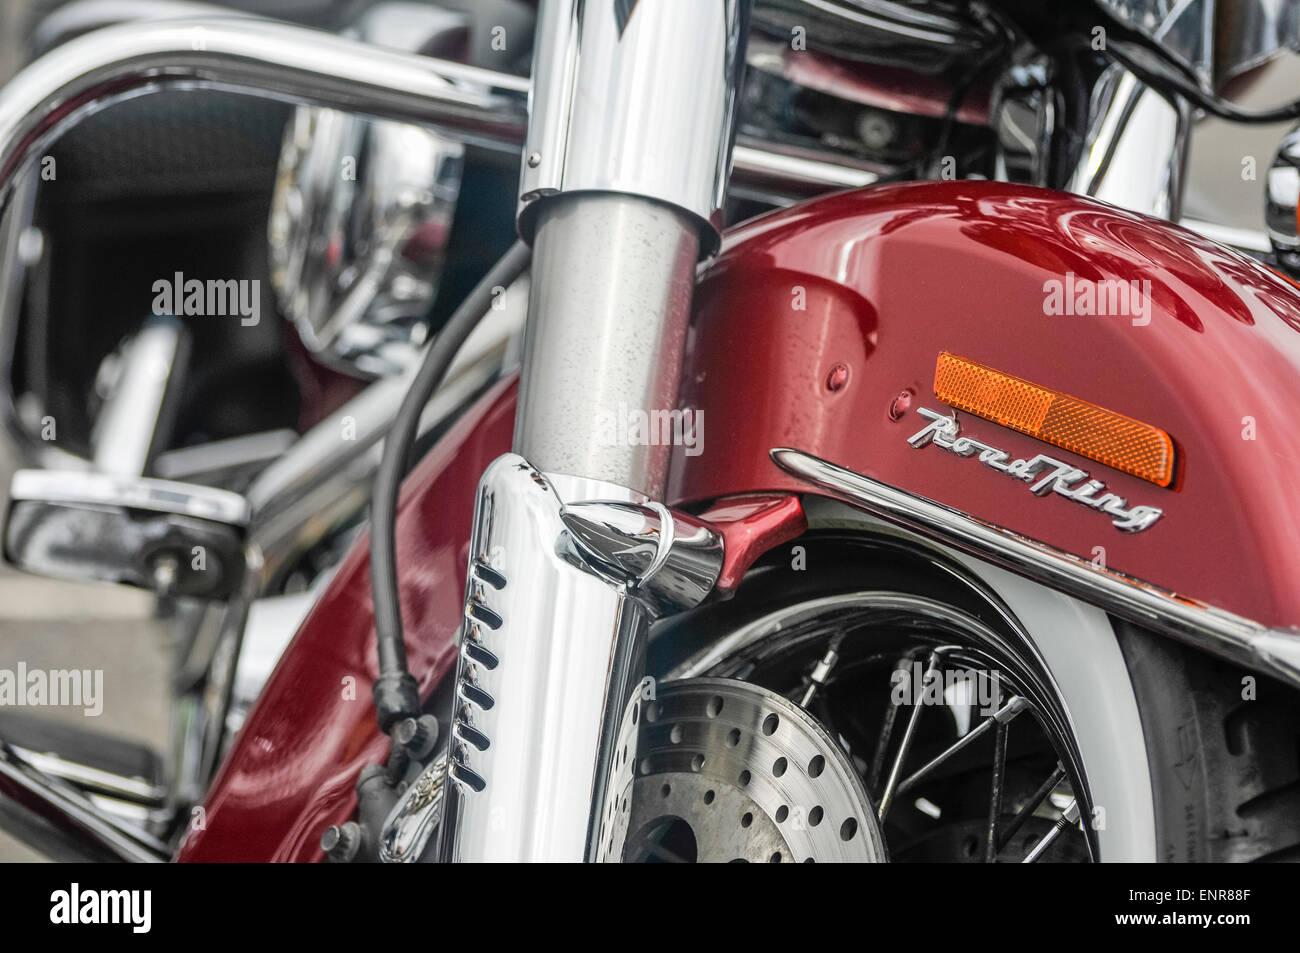 Harley Davidson Road King motorcycle - Stock Image